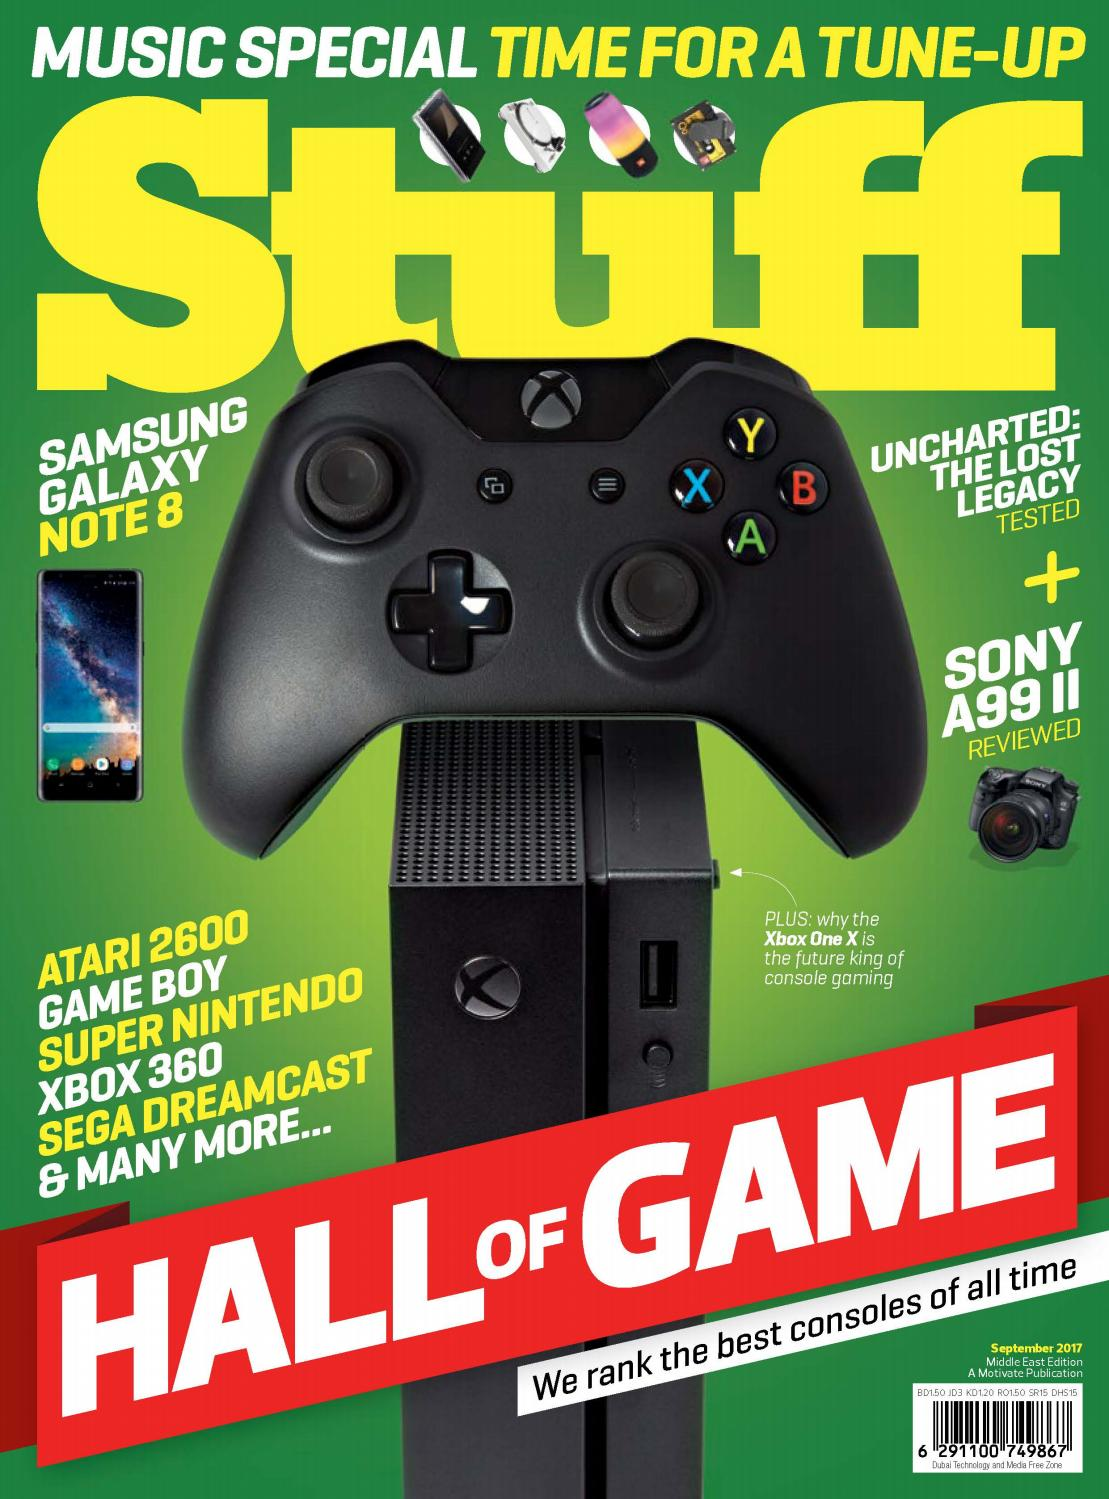 Manuals & Guides Arcade Gaming To Ensure Smooth Transmission Sega Space Fury Rare Manual Free Usa Shipping Media Mail